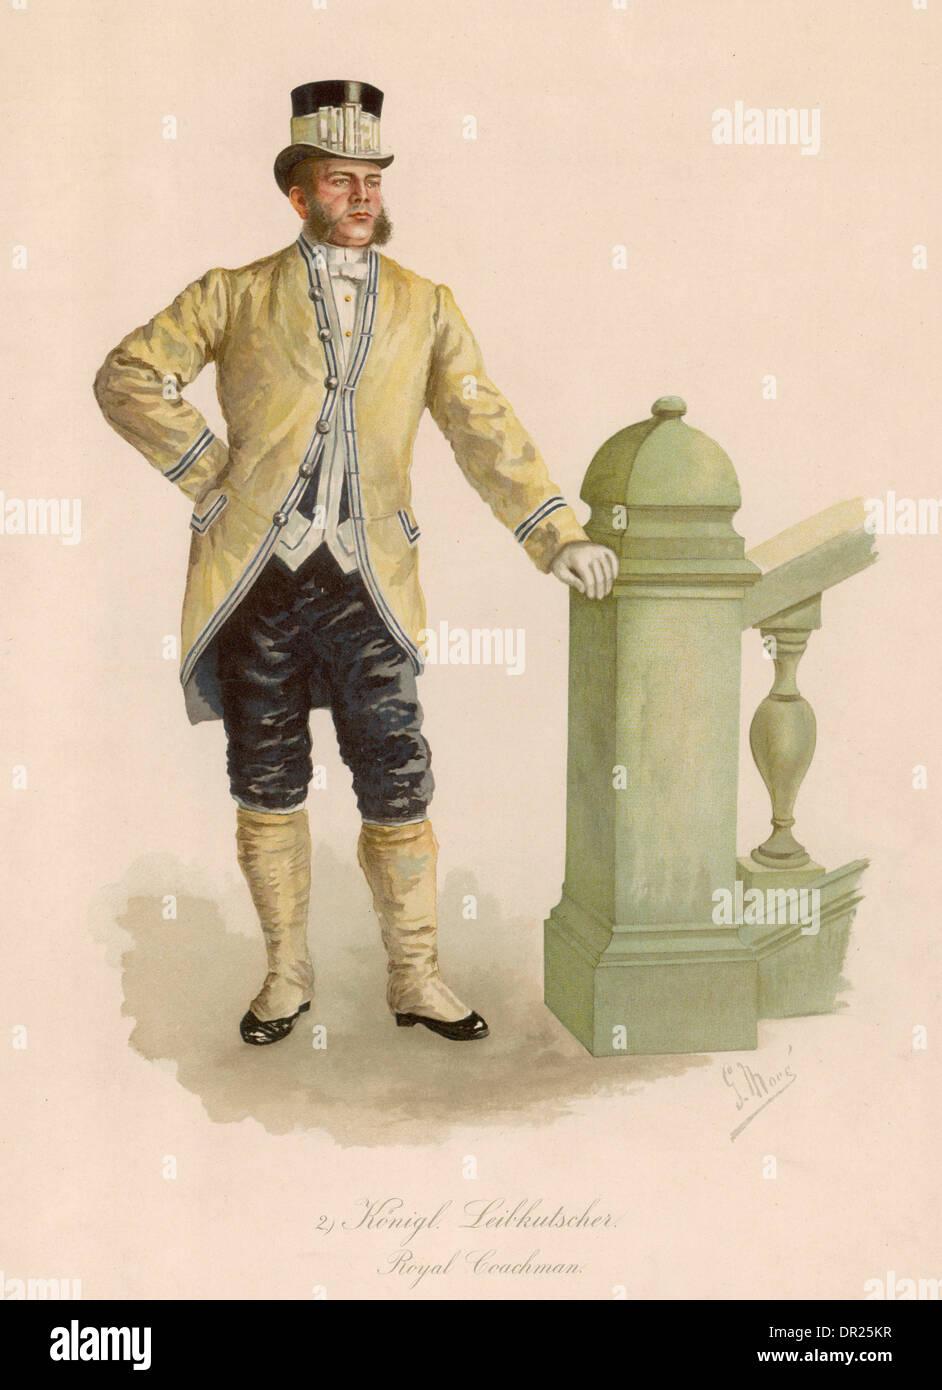 ROYAL COACHMAN (GERMAN) - Stock Image